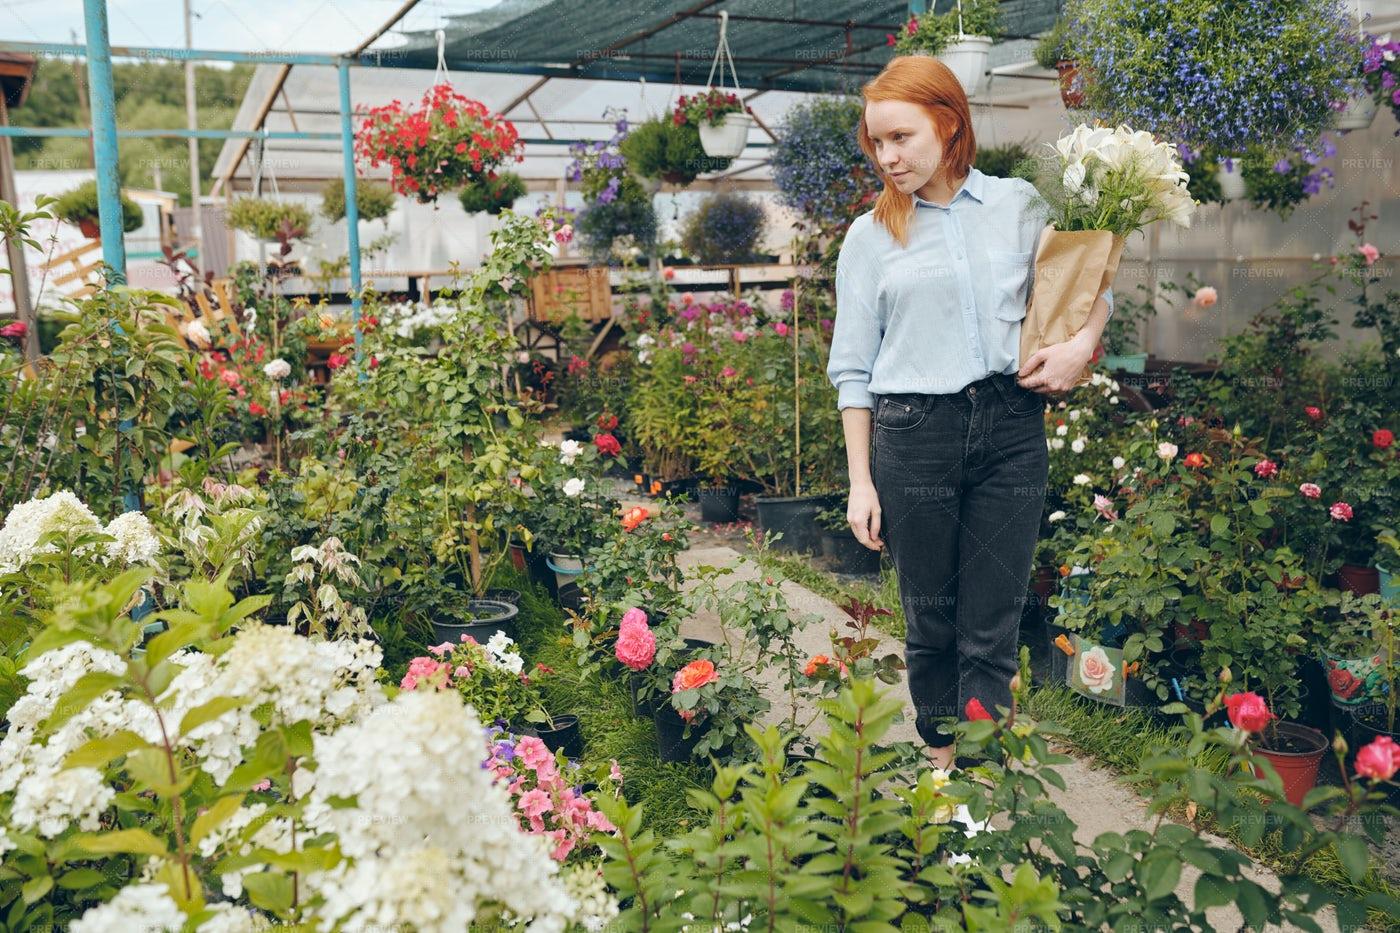 Redhead Girl Choosing Flowers In...: Stock Photos